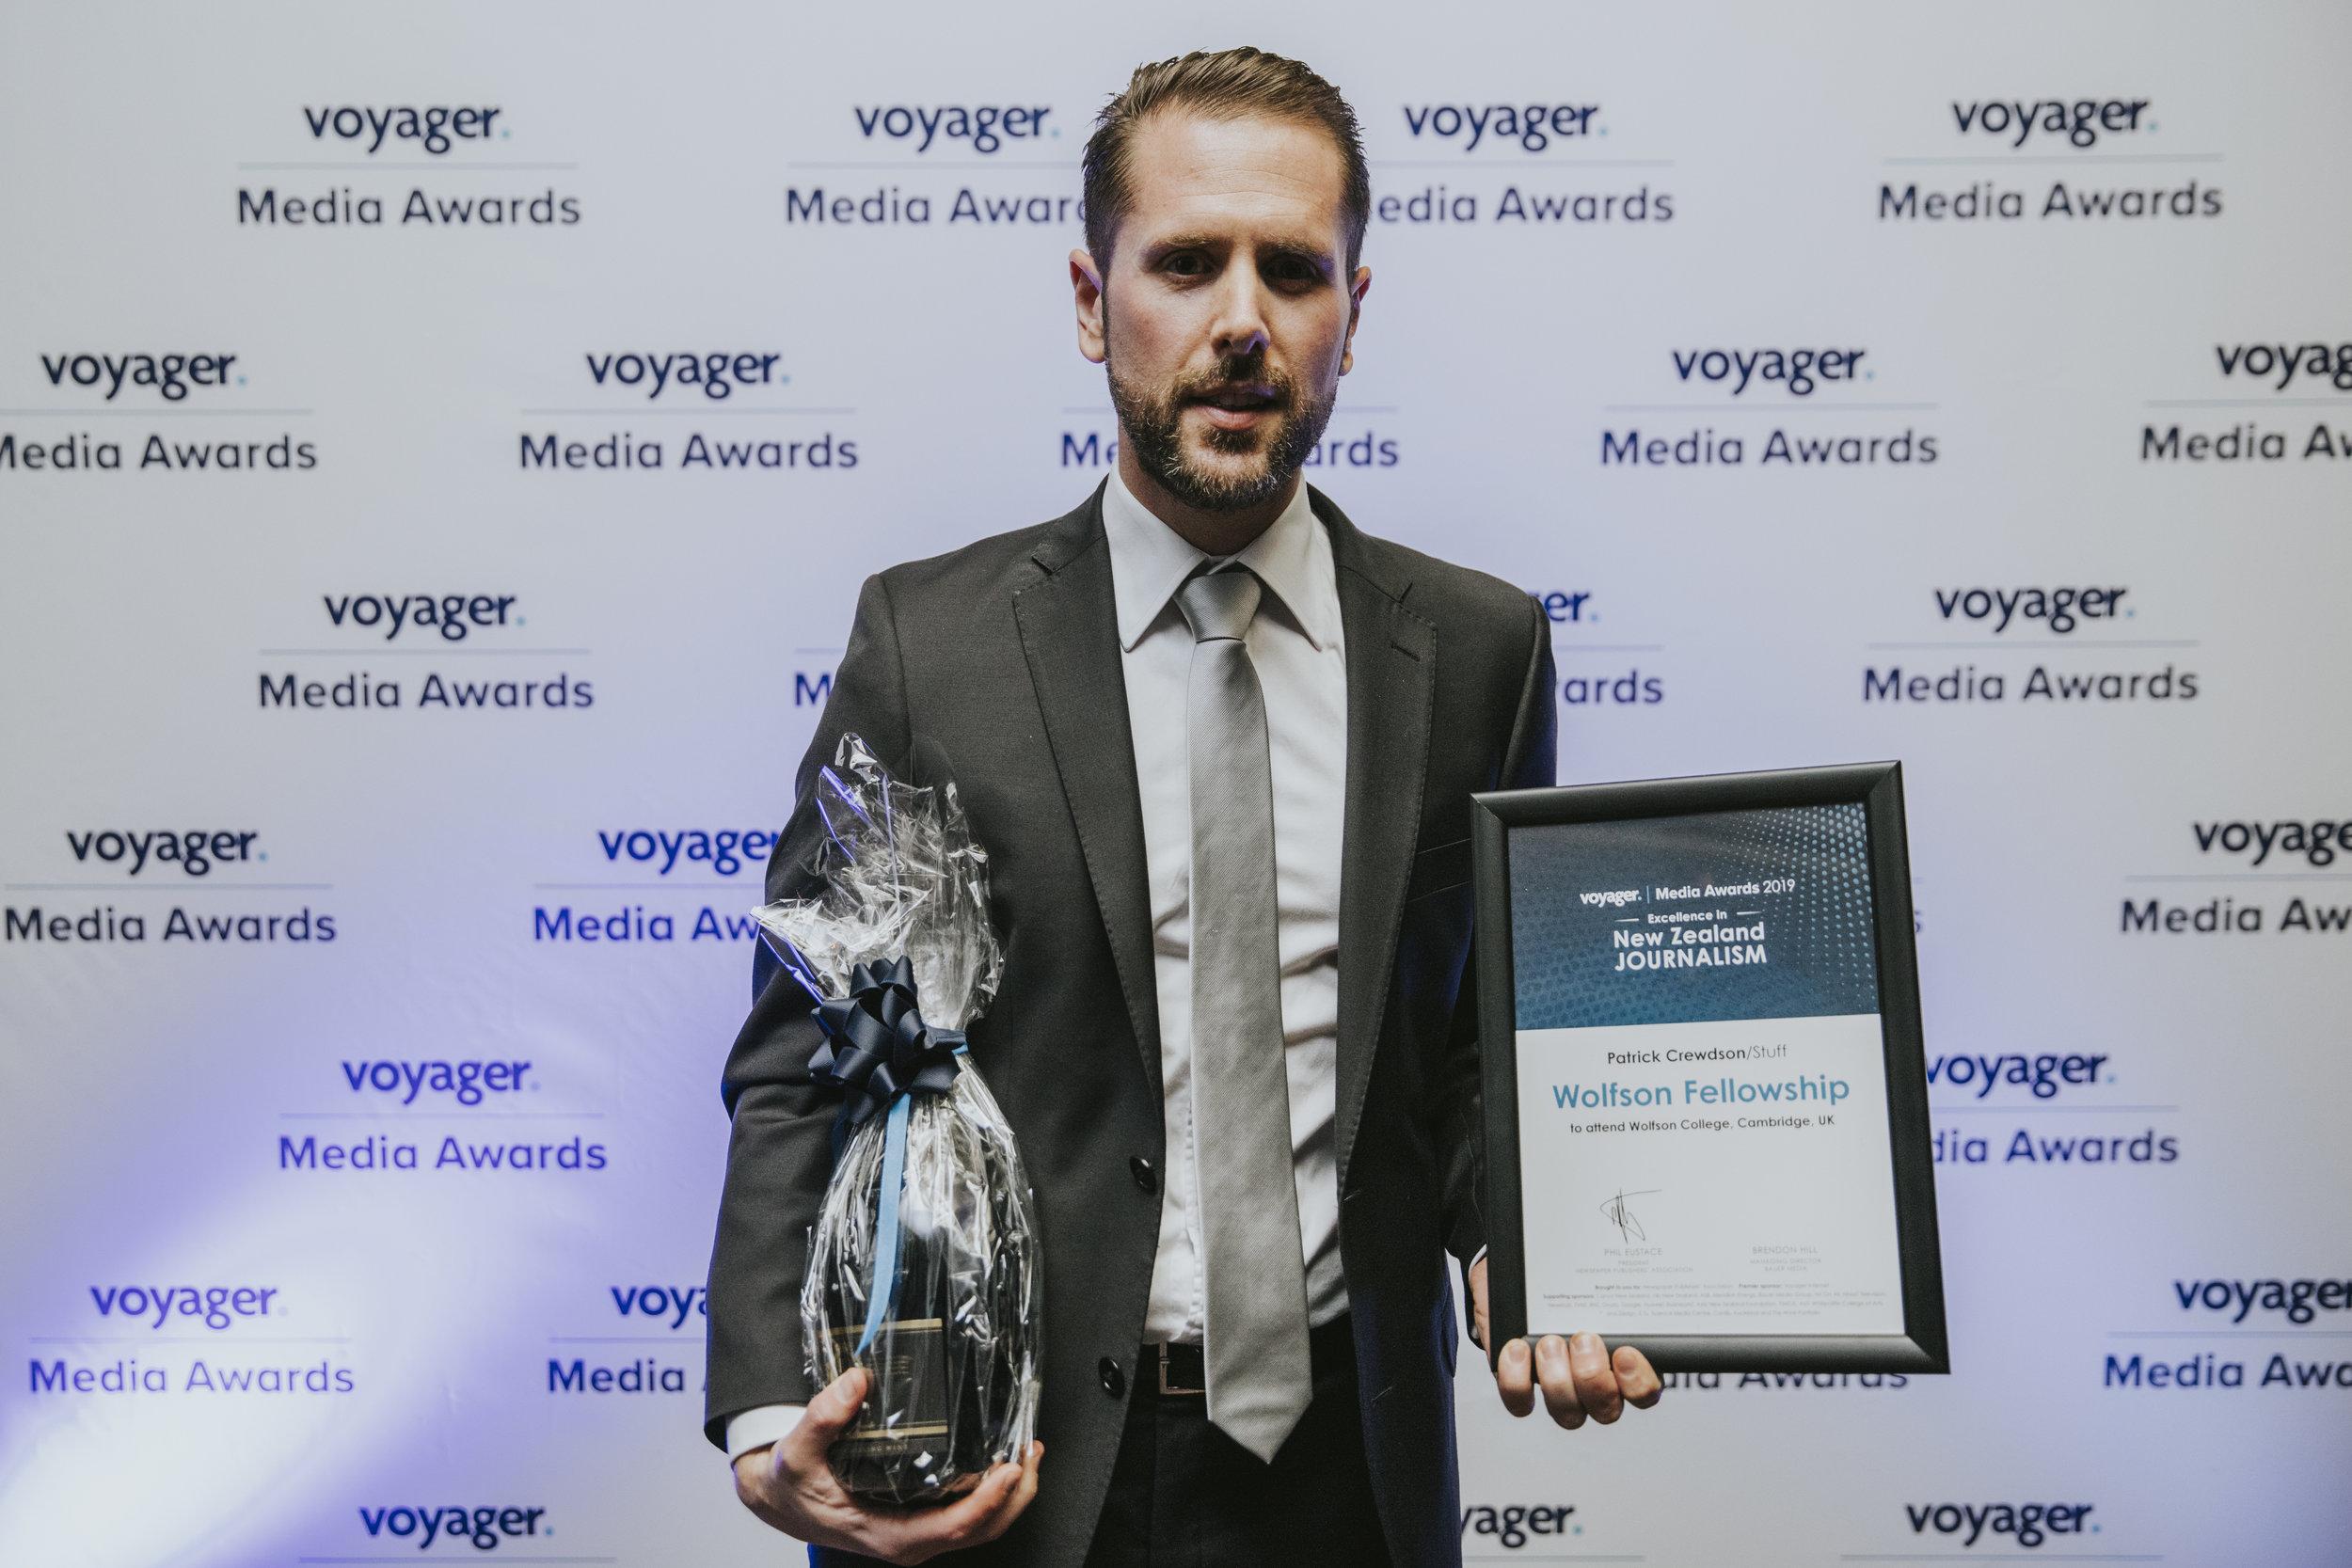 VOYAGER MEDIA AWARDS 2019 WOLFSON FELLOWSHIP-12.JPG